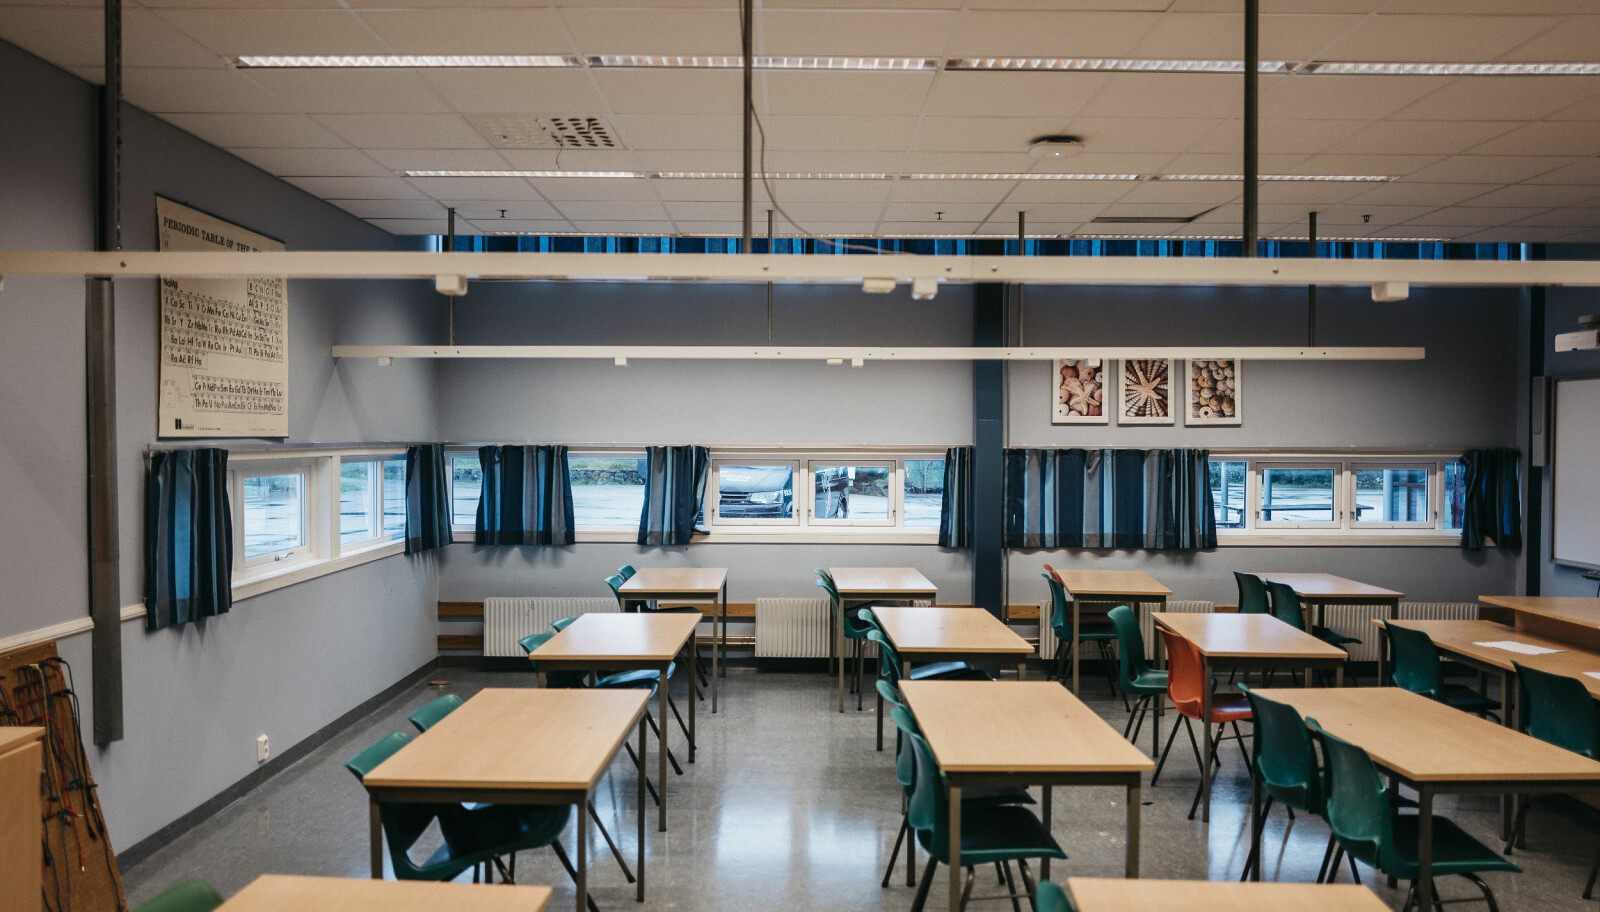 Klasserom på Frakkagjerd ungdomsskole. FOTO: Tommy Ellingsen